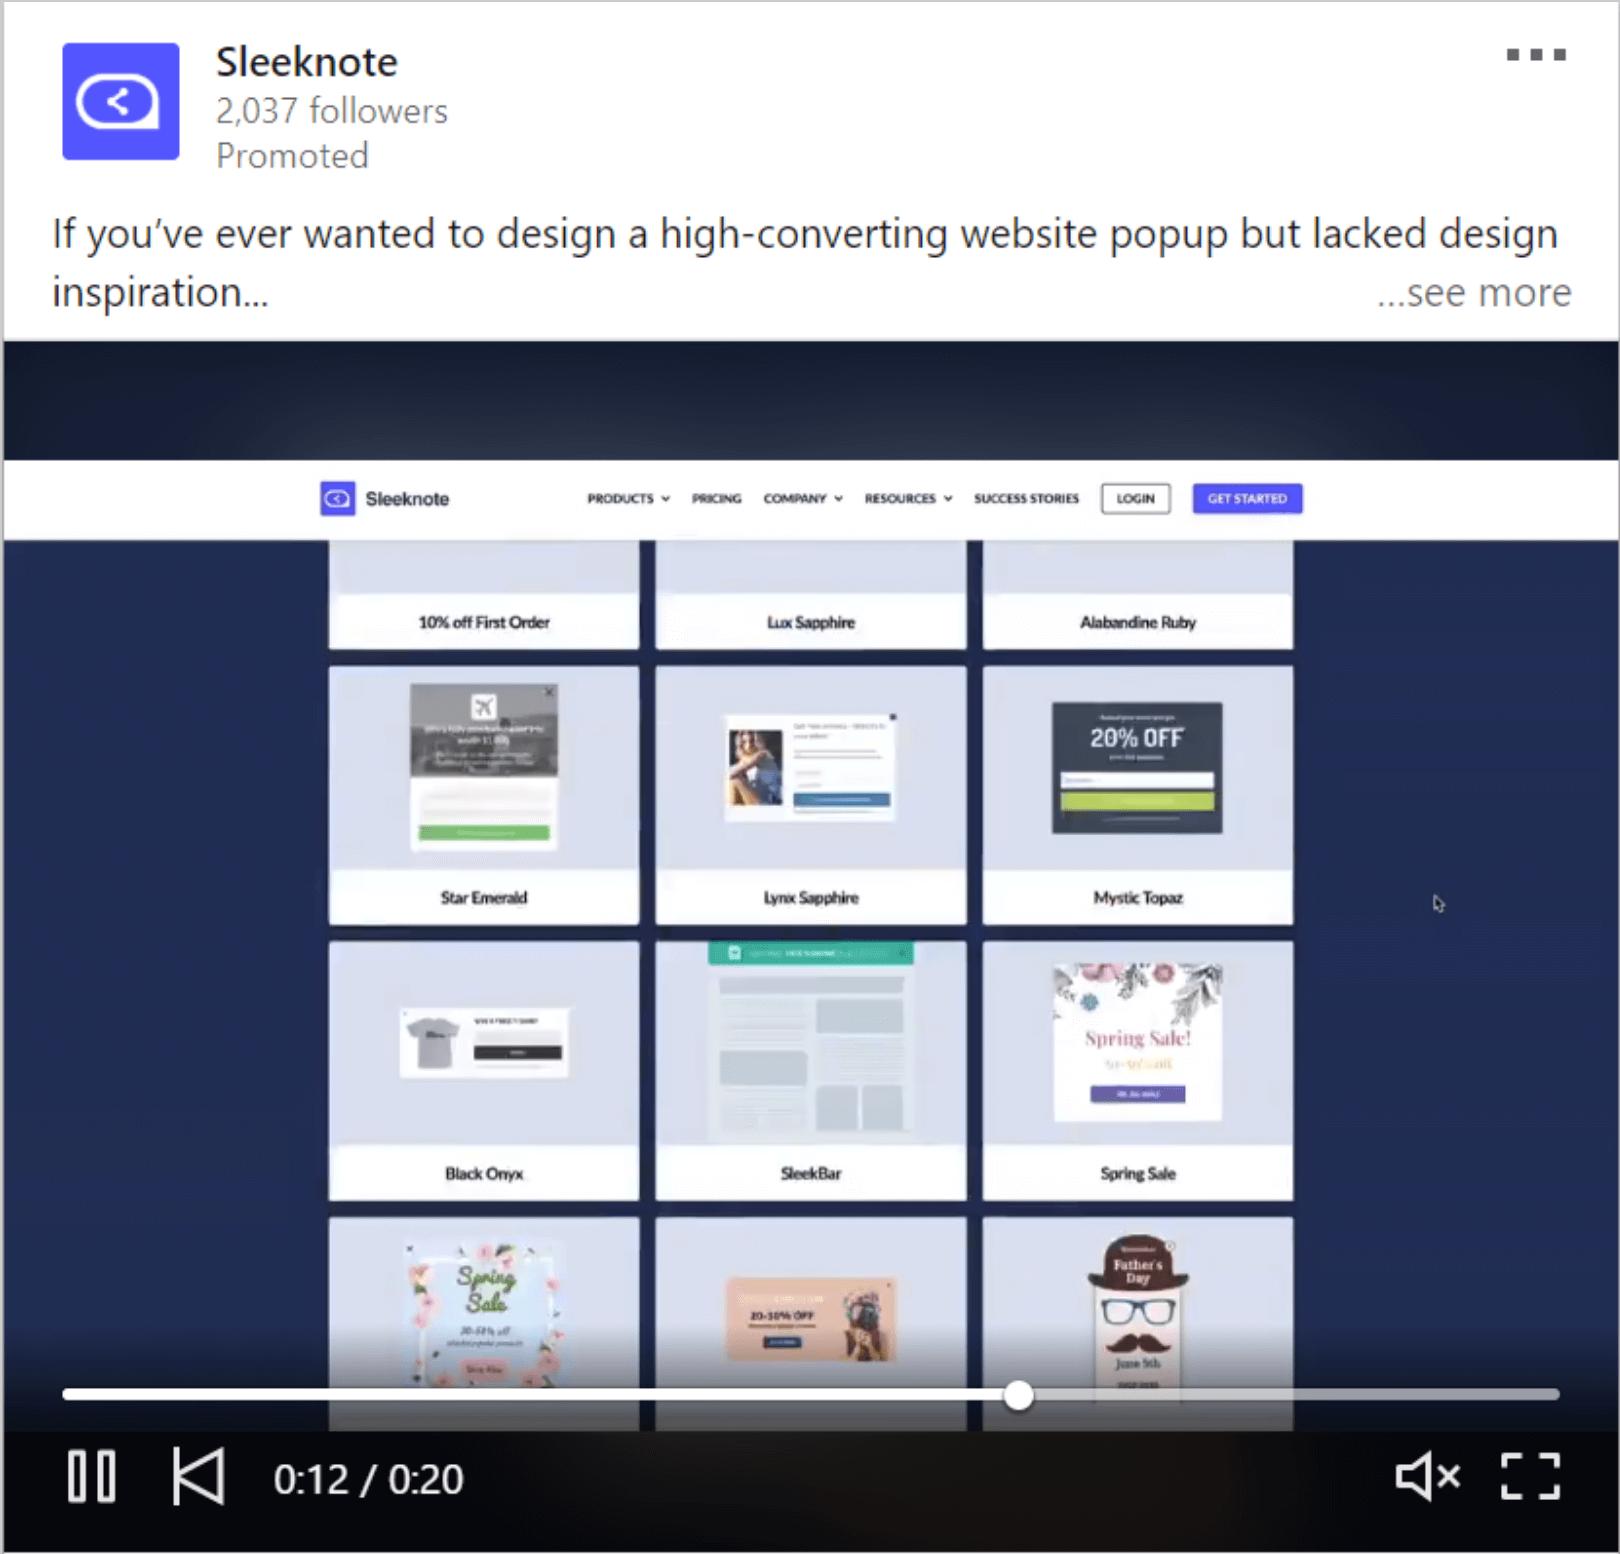 Sleeknote Video Advertisement